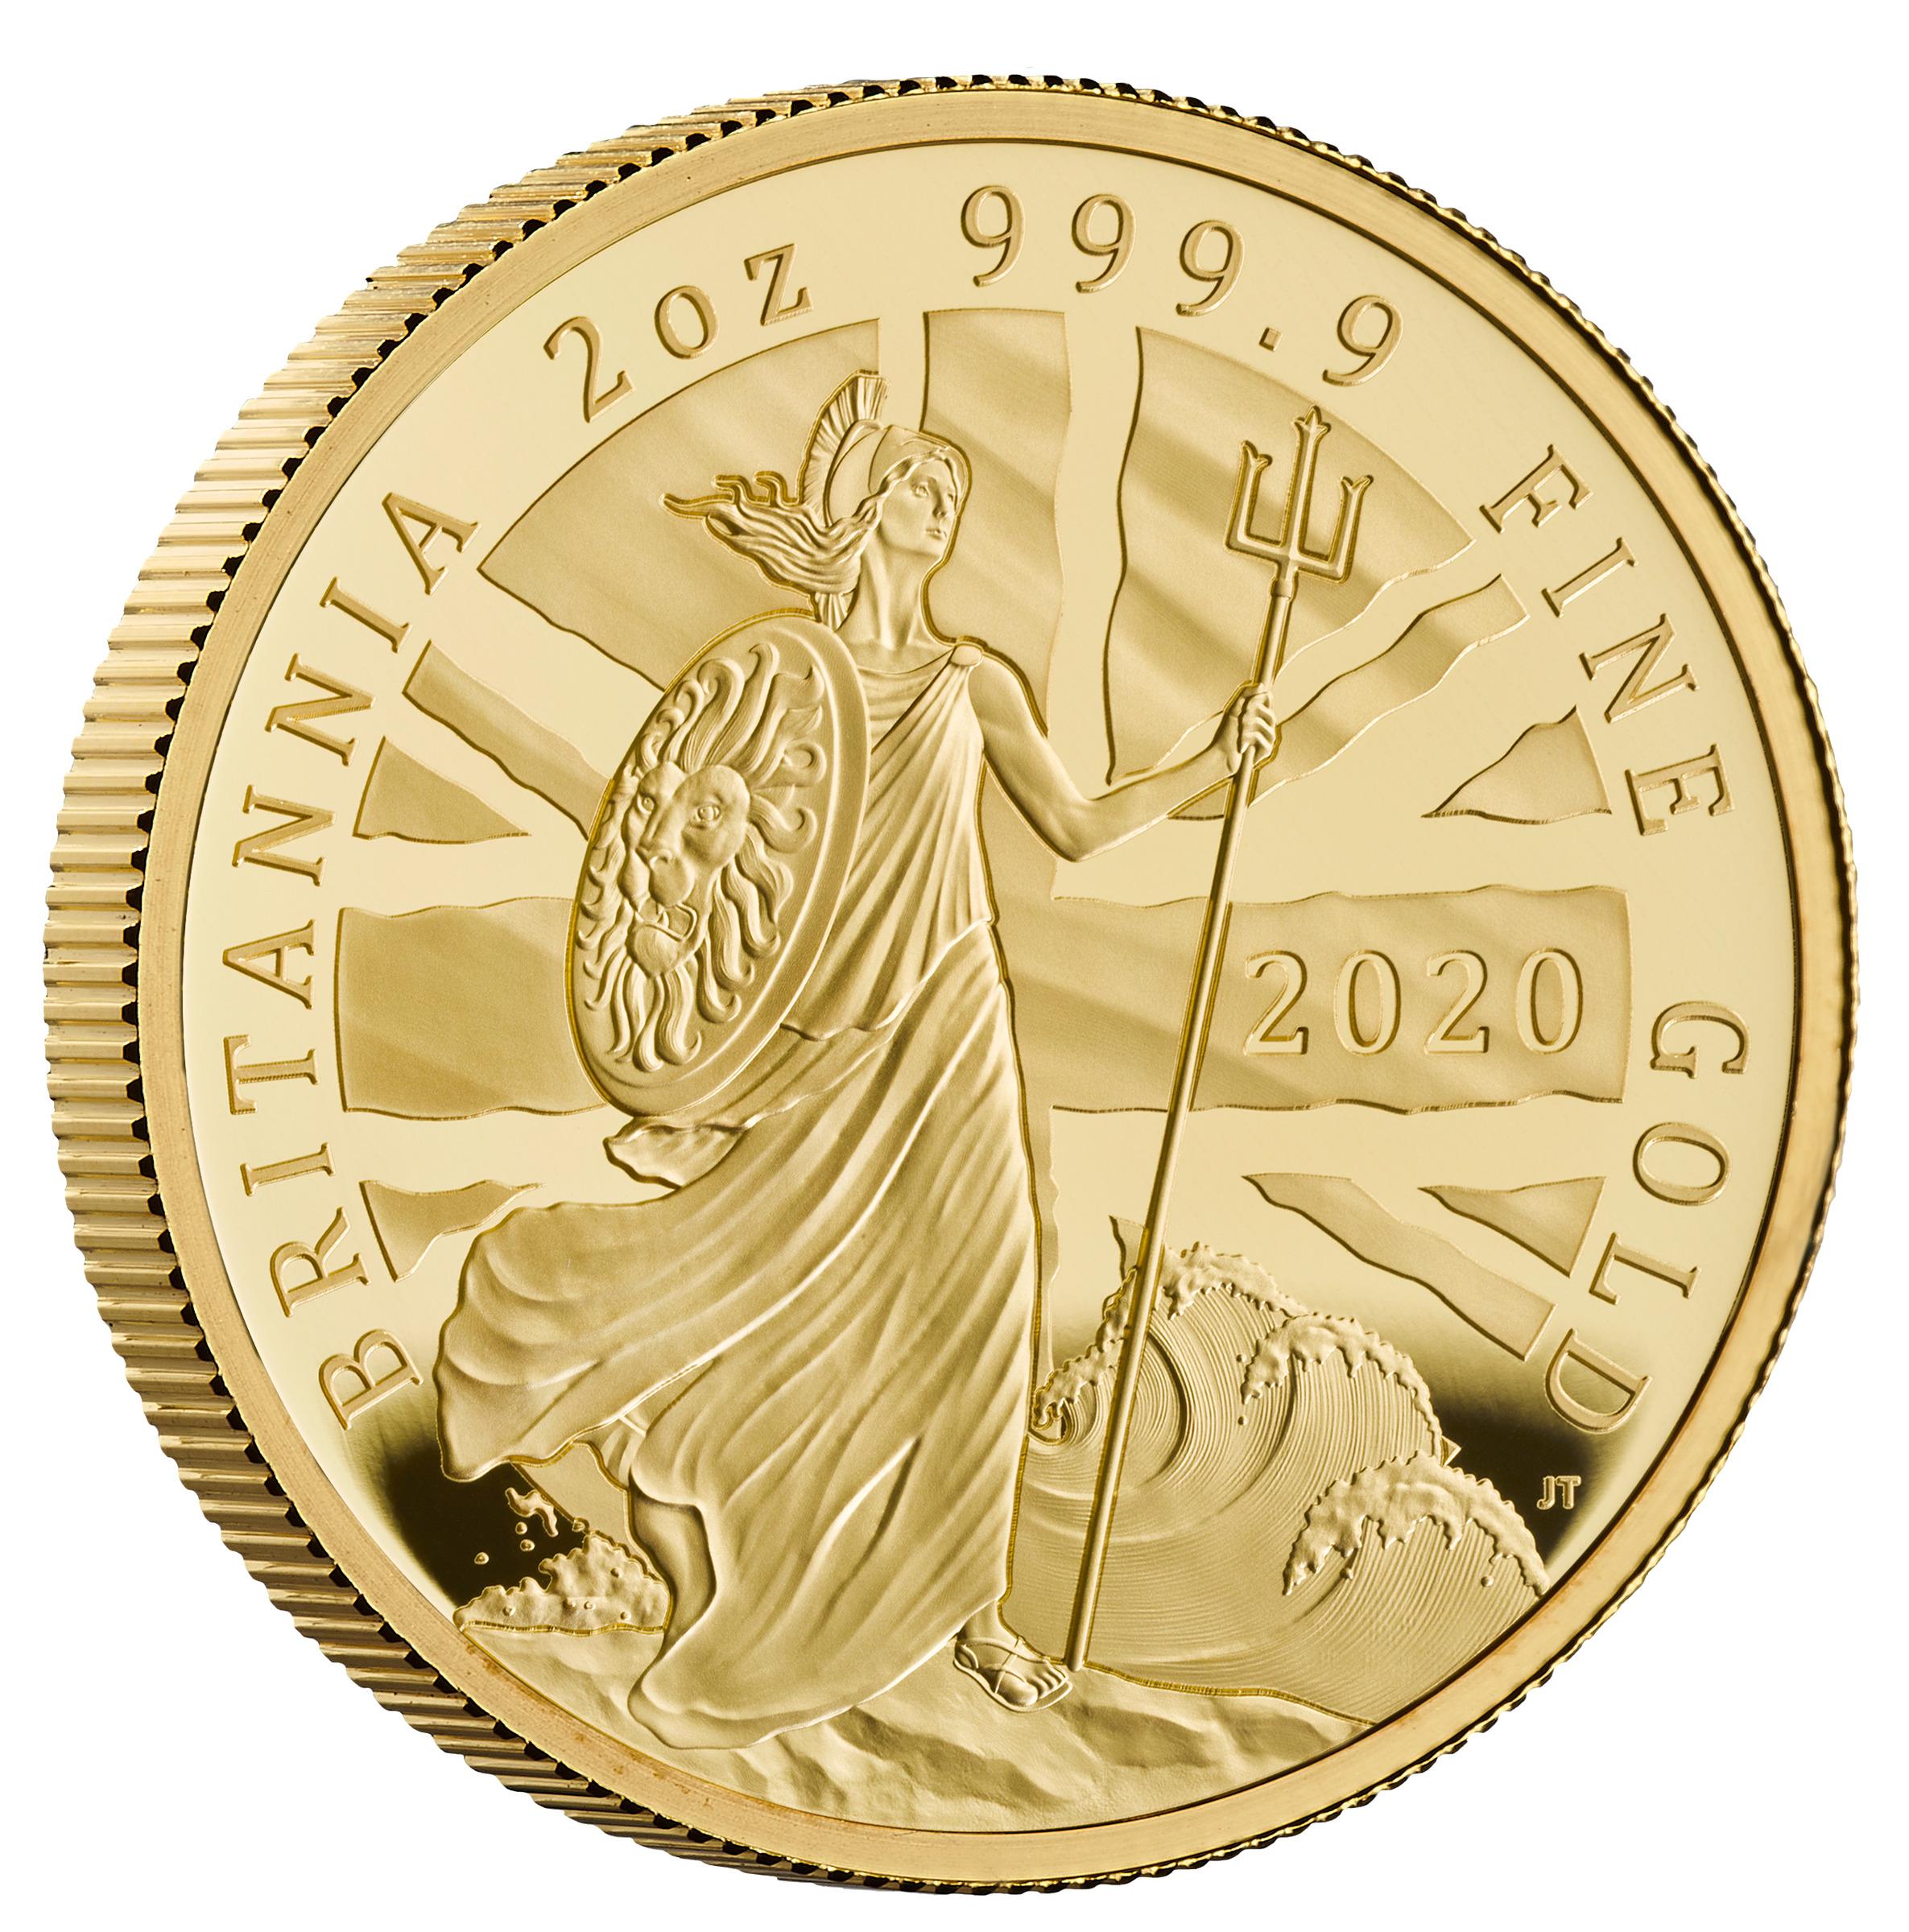 GB 200 Pound 2020